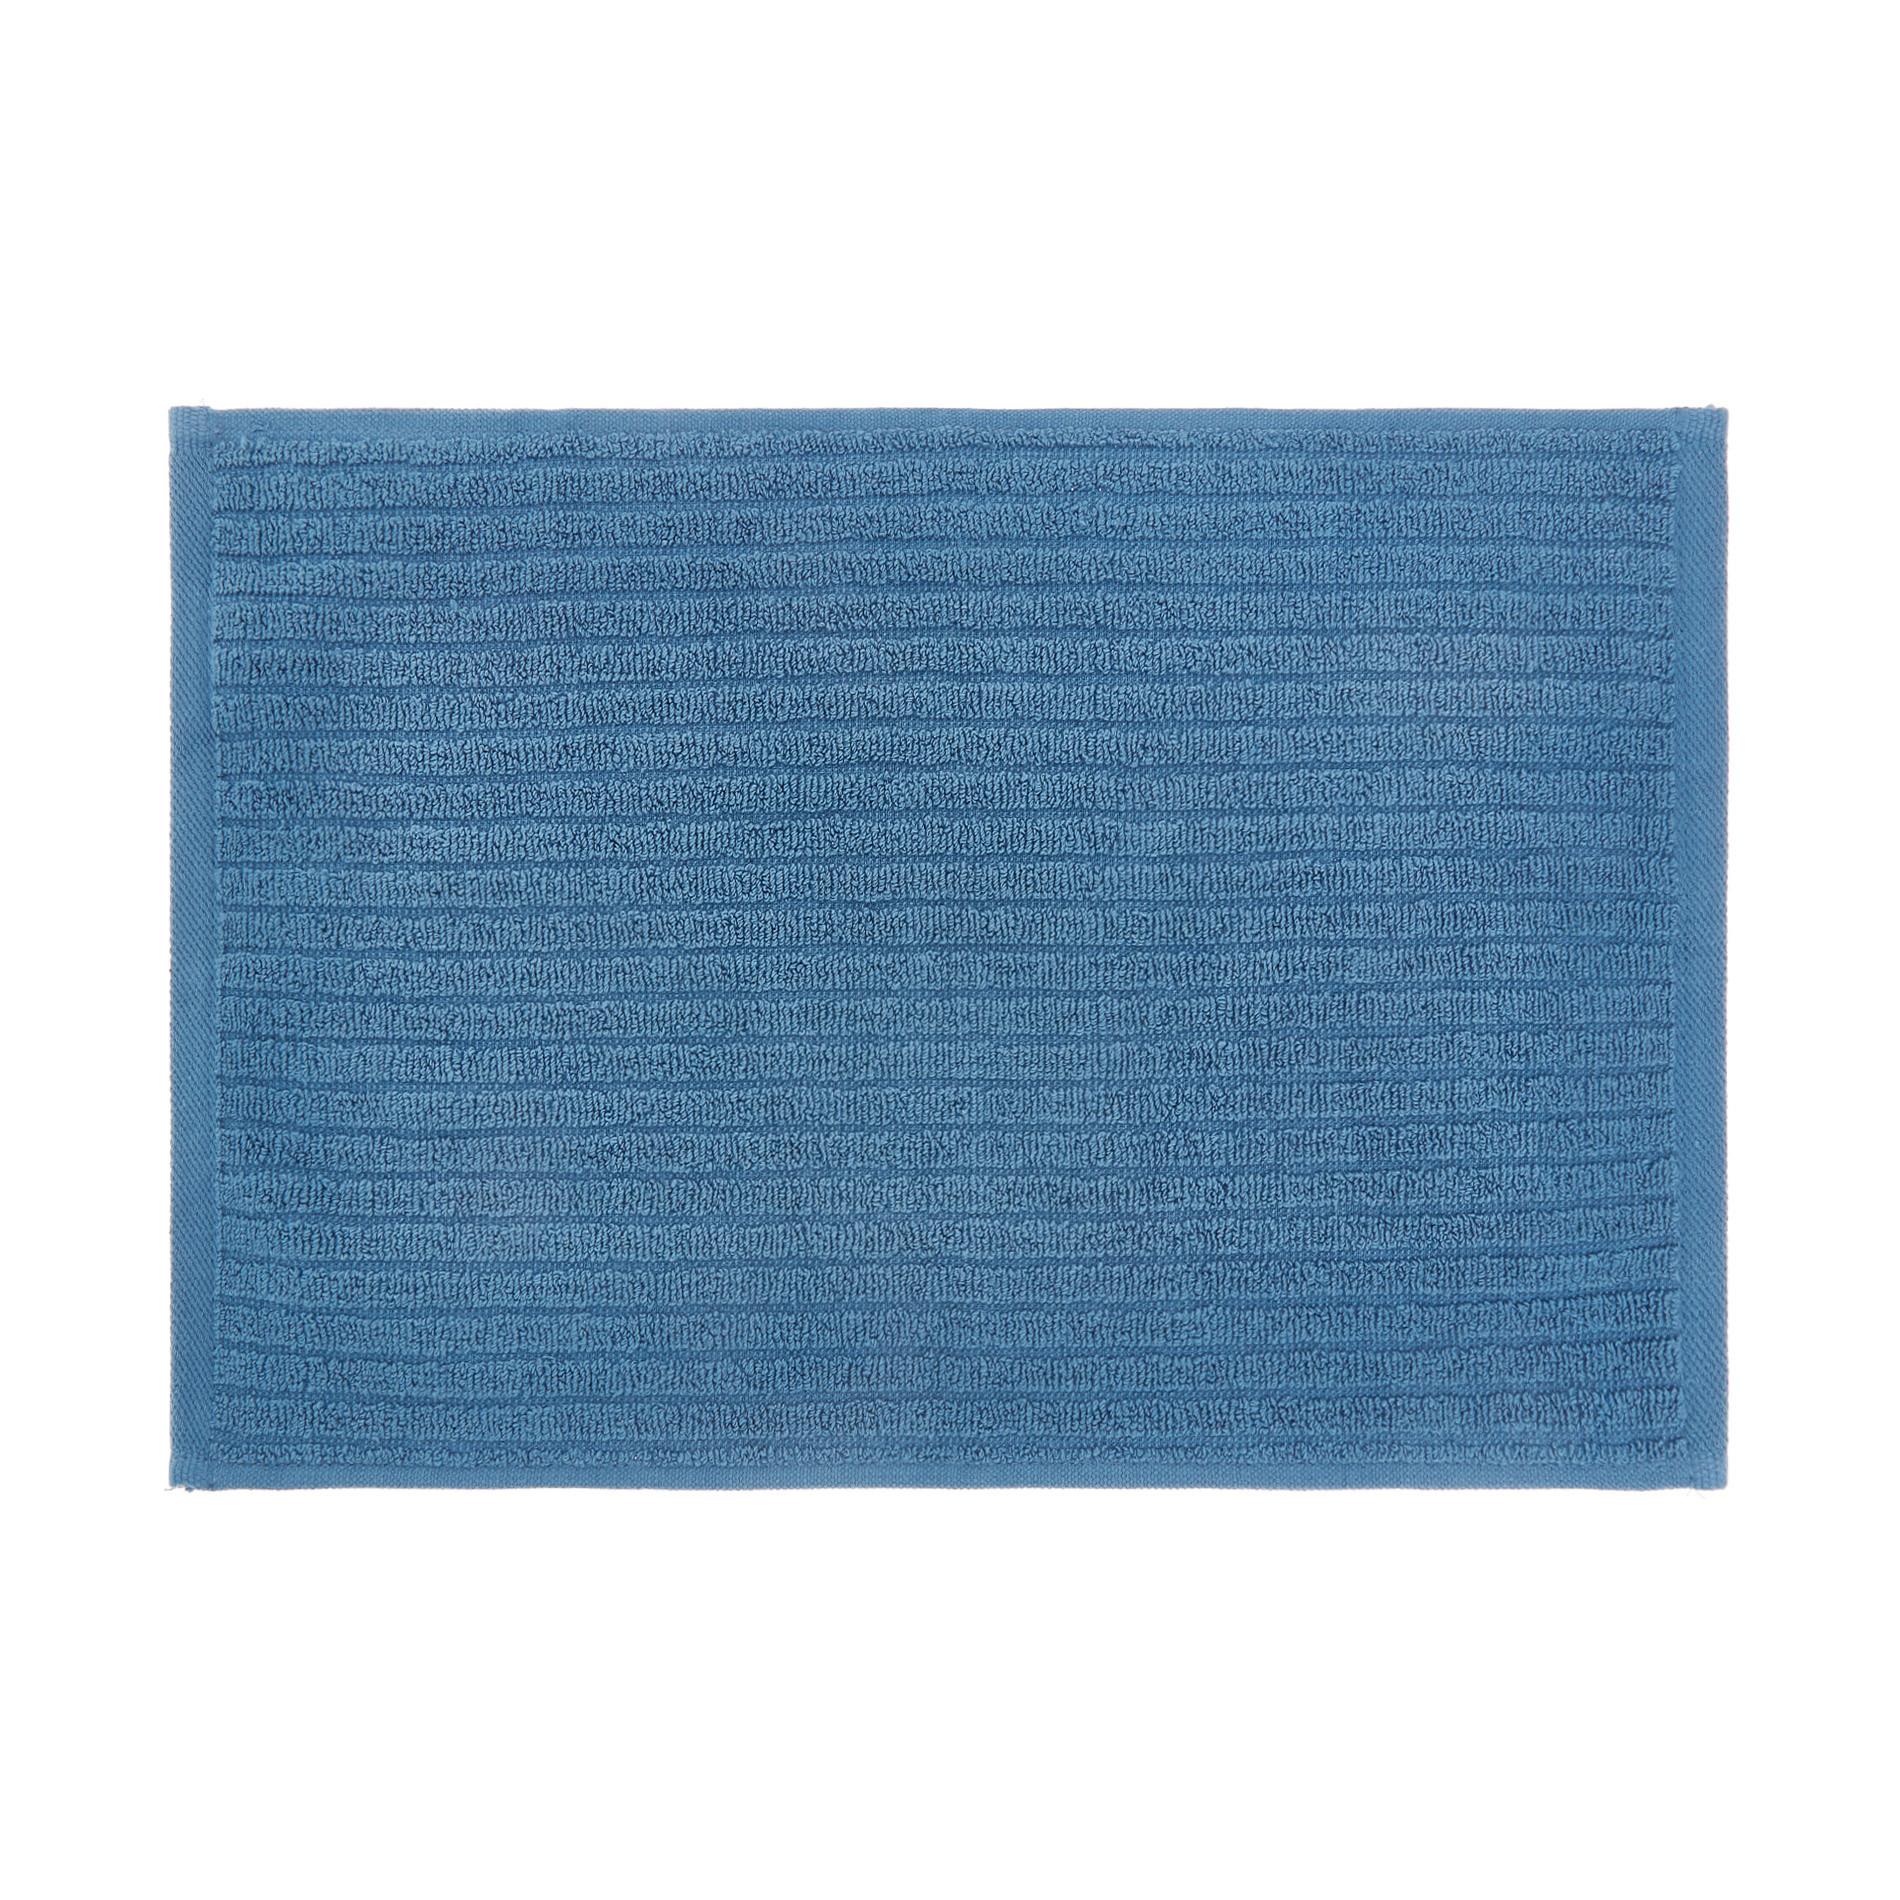 Set asciugamani puro cotone righe jacquard tinta unita, Blu, large image number 2